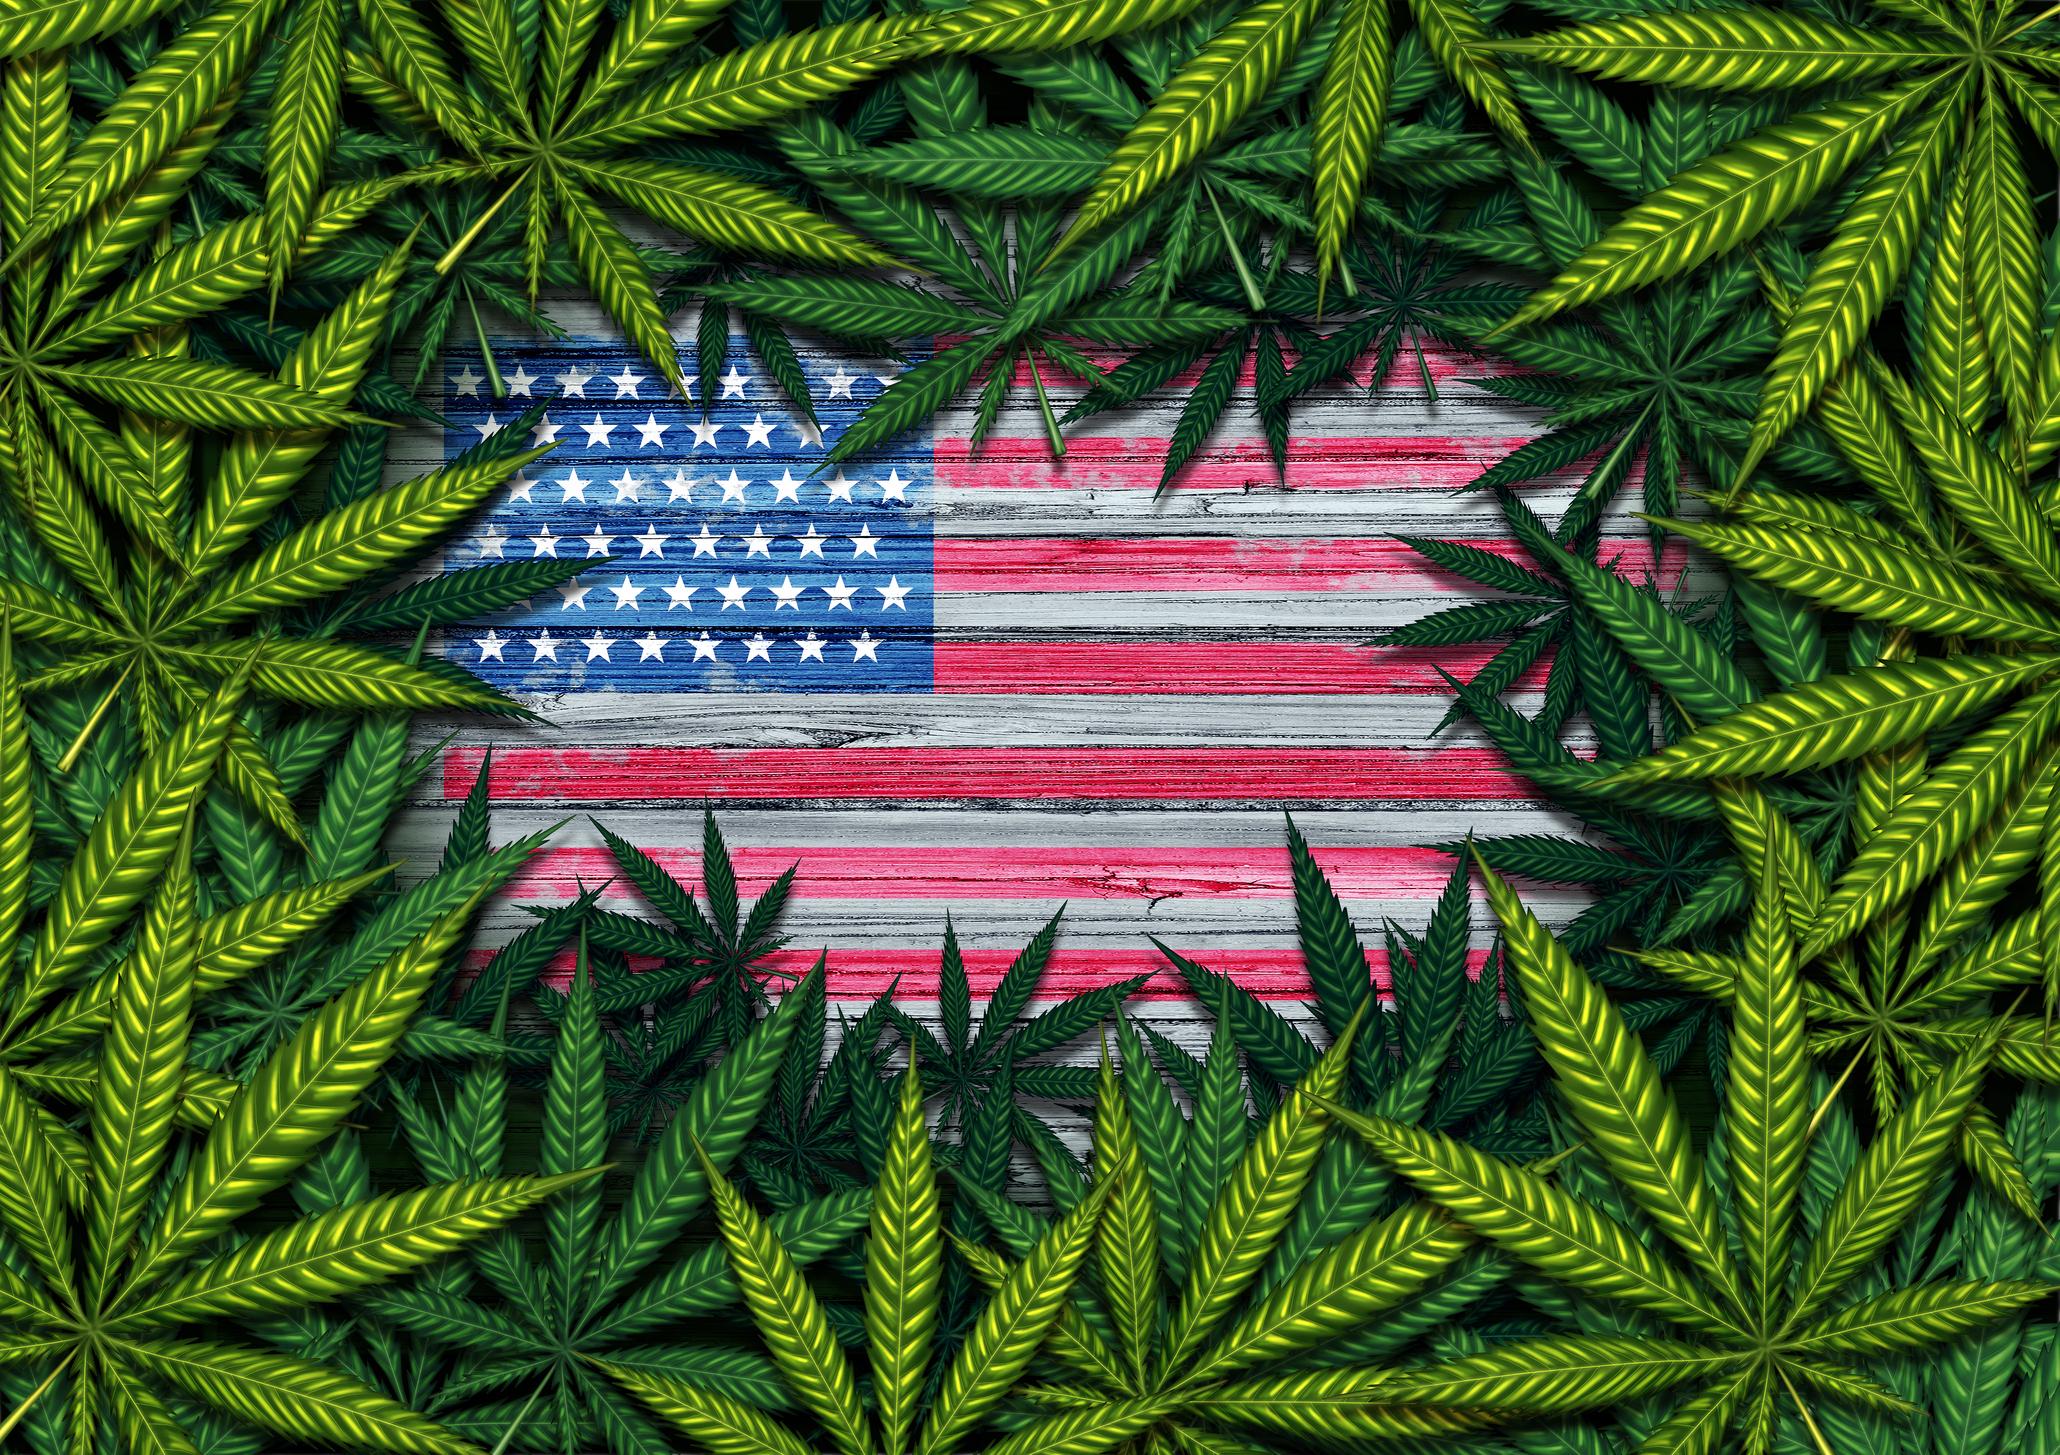 Marijuana leaves forming border around rustic drawing of U.S. flag